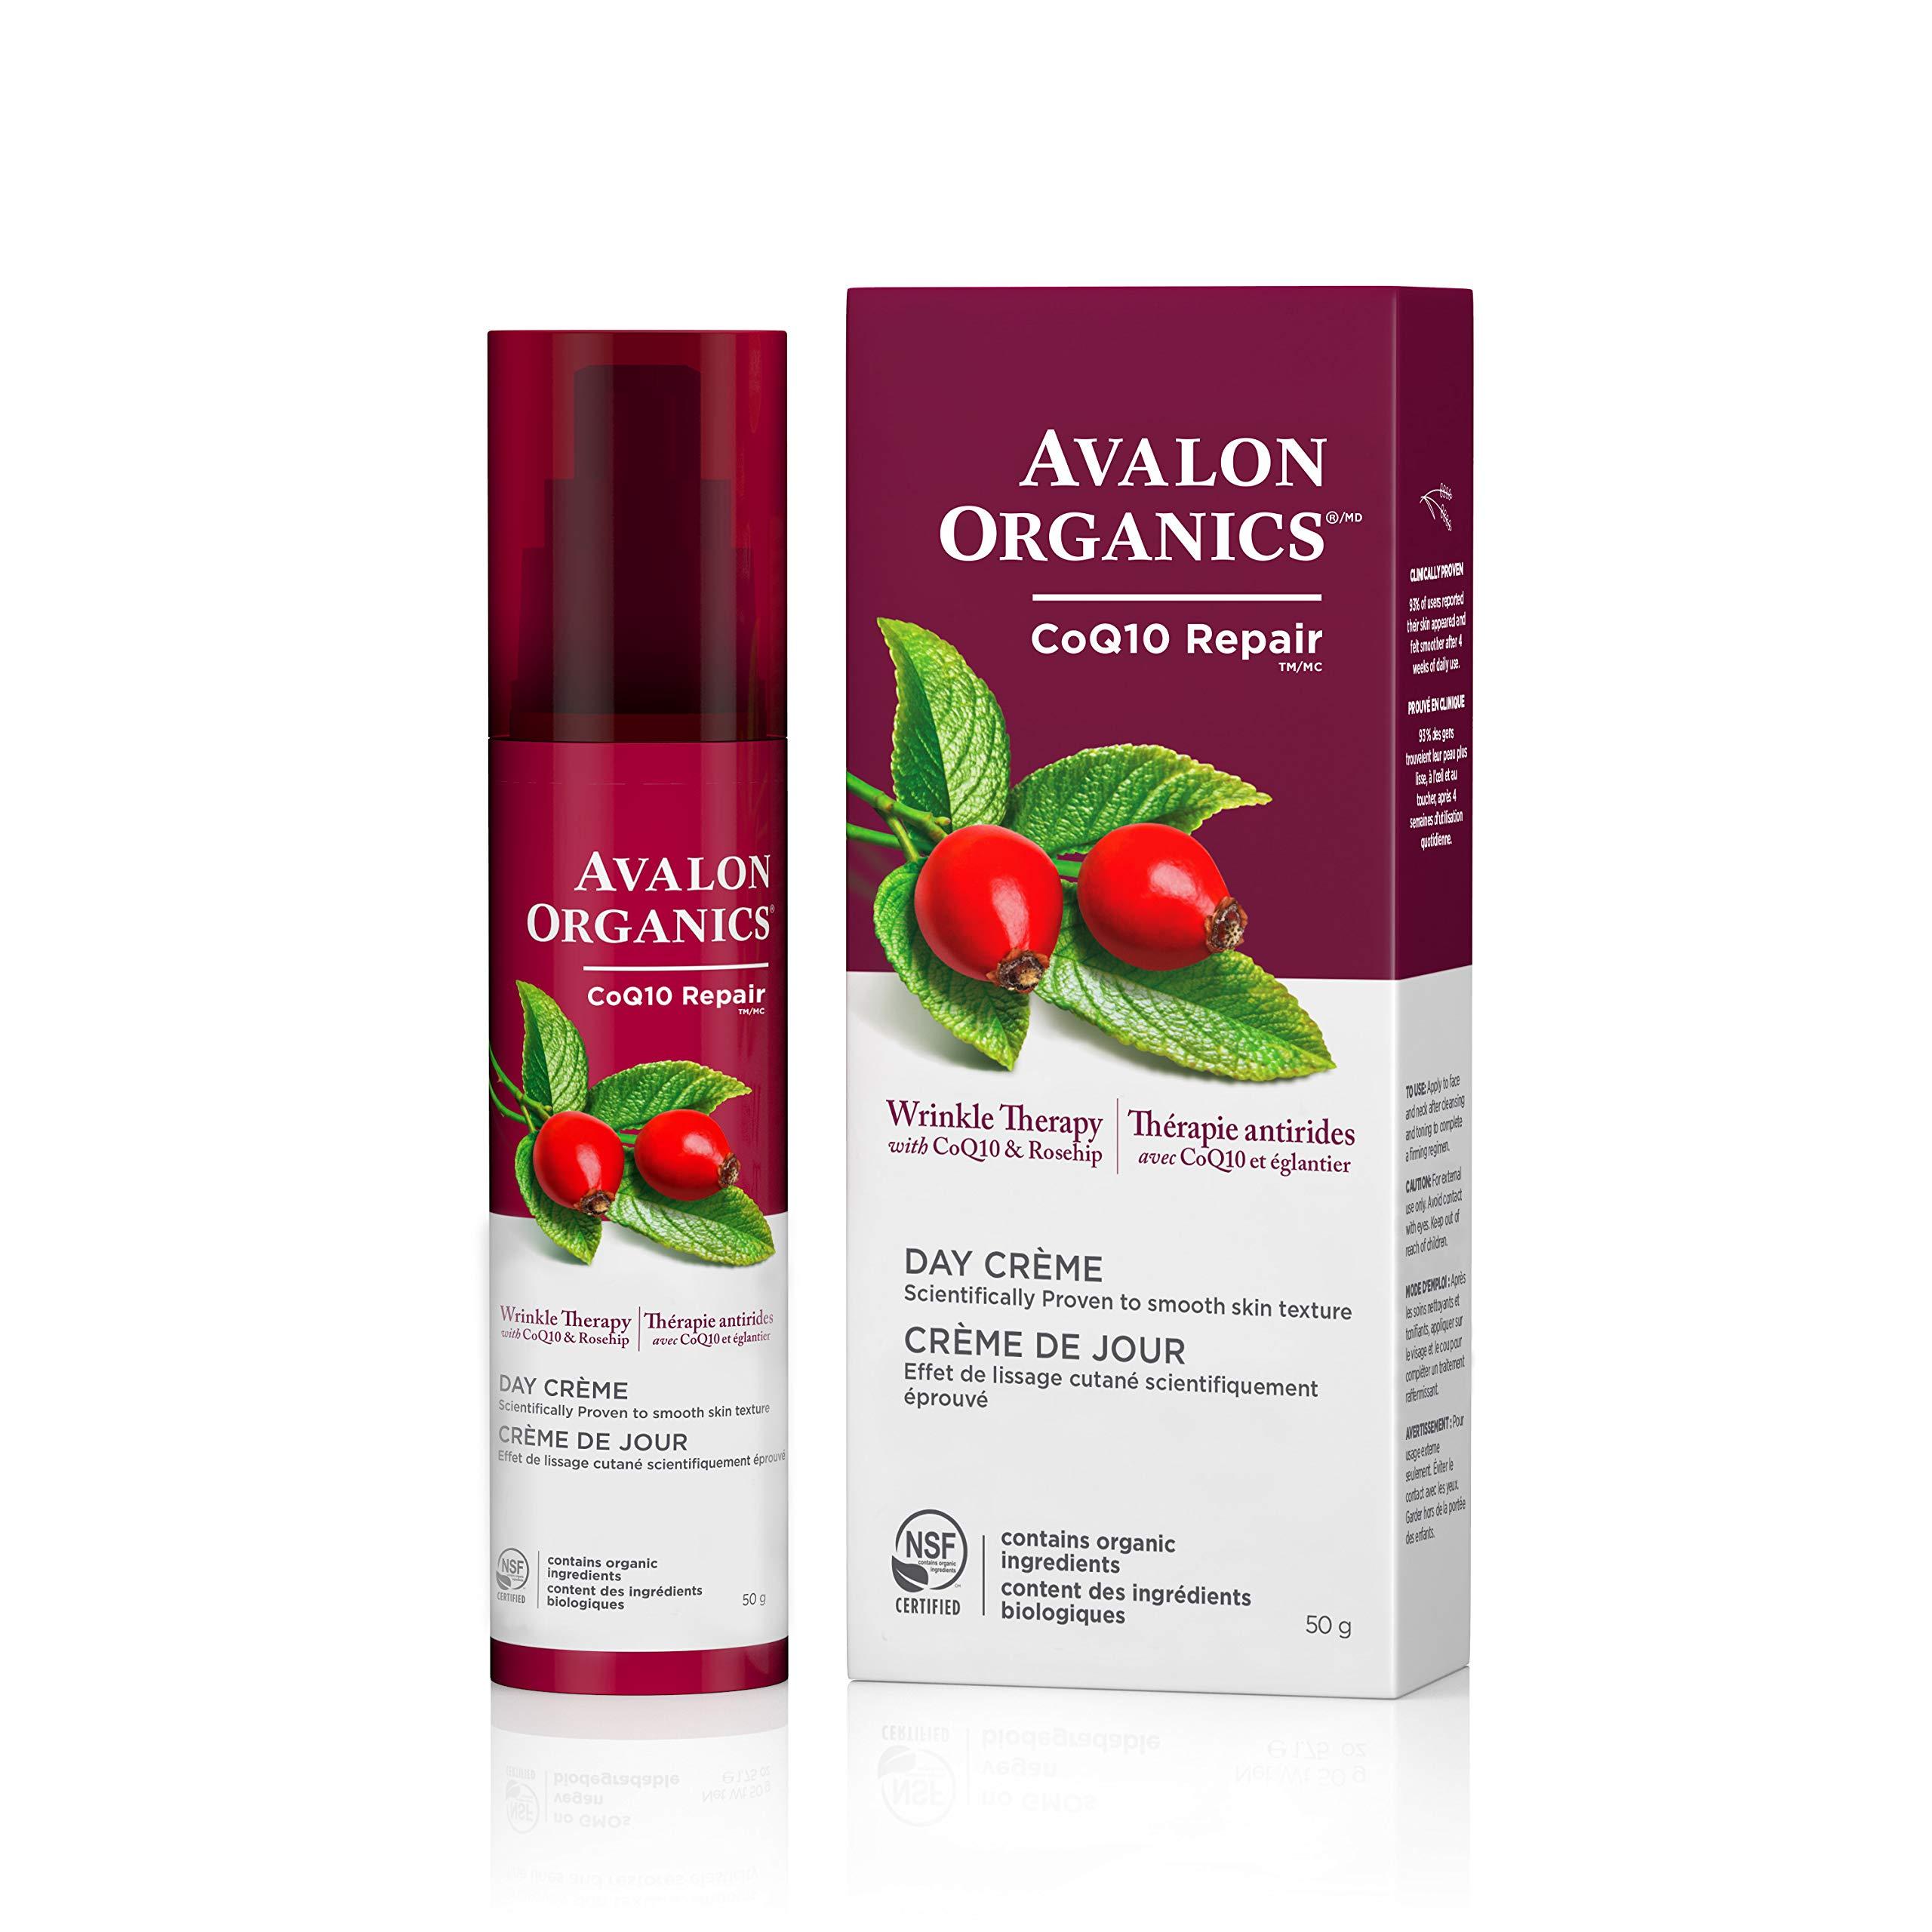 Avalon Organics Wrinkle Therapy Cr%C3%A8me